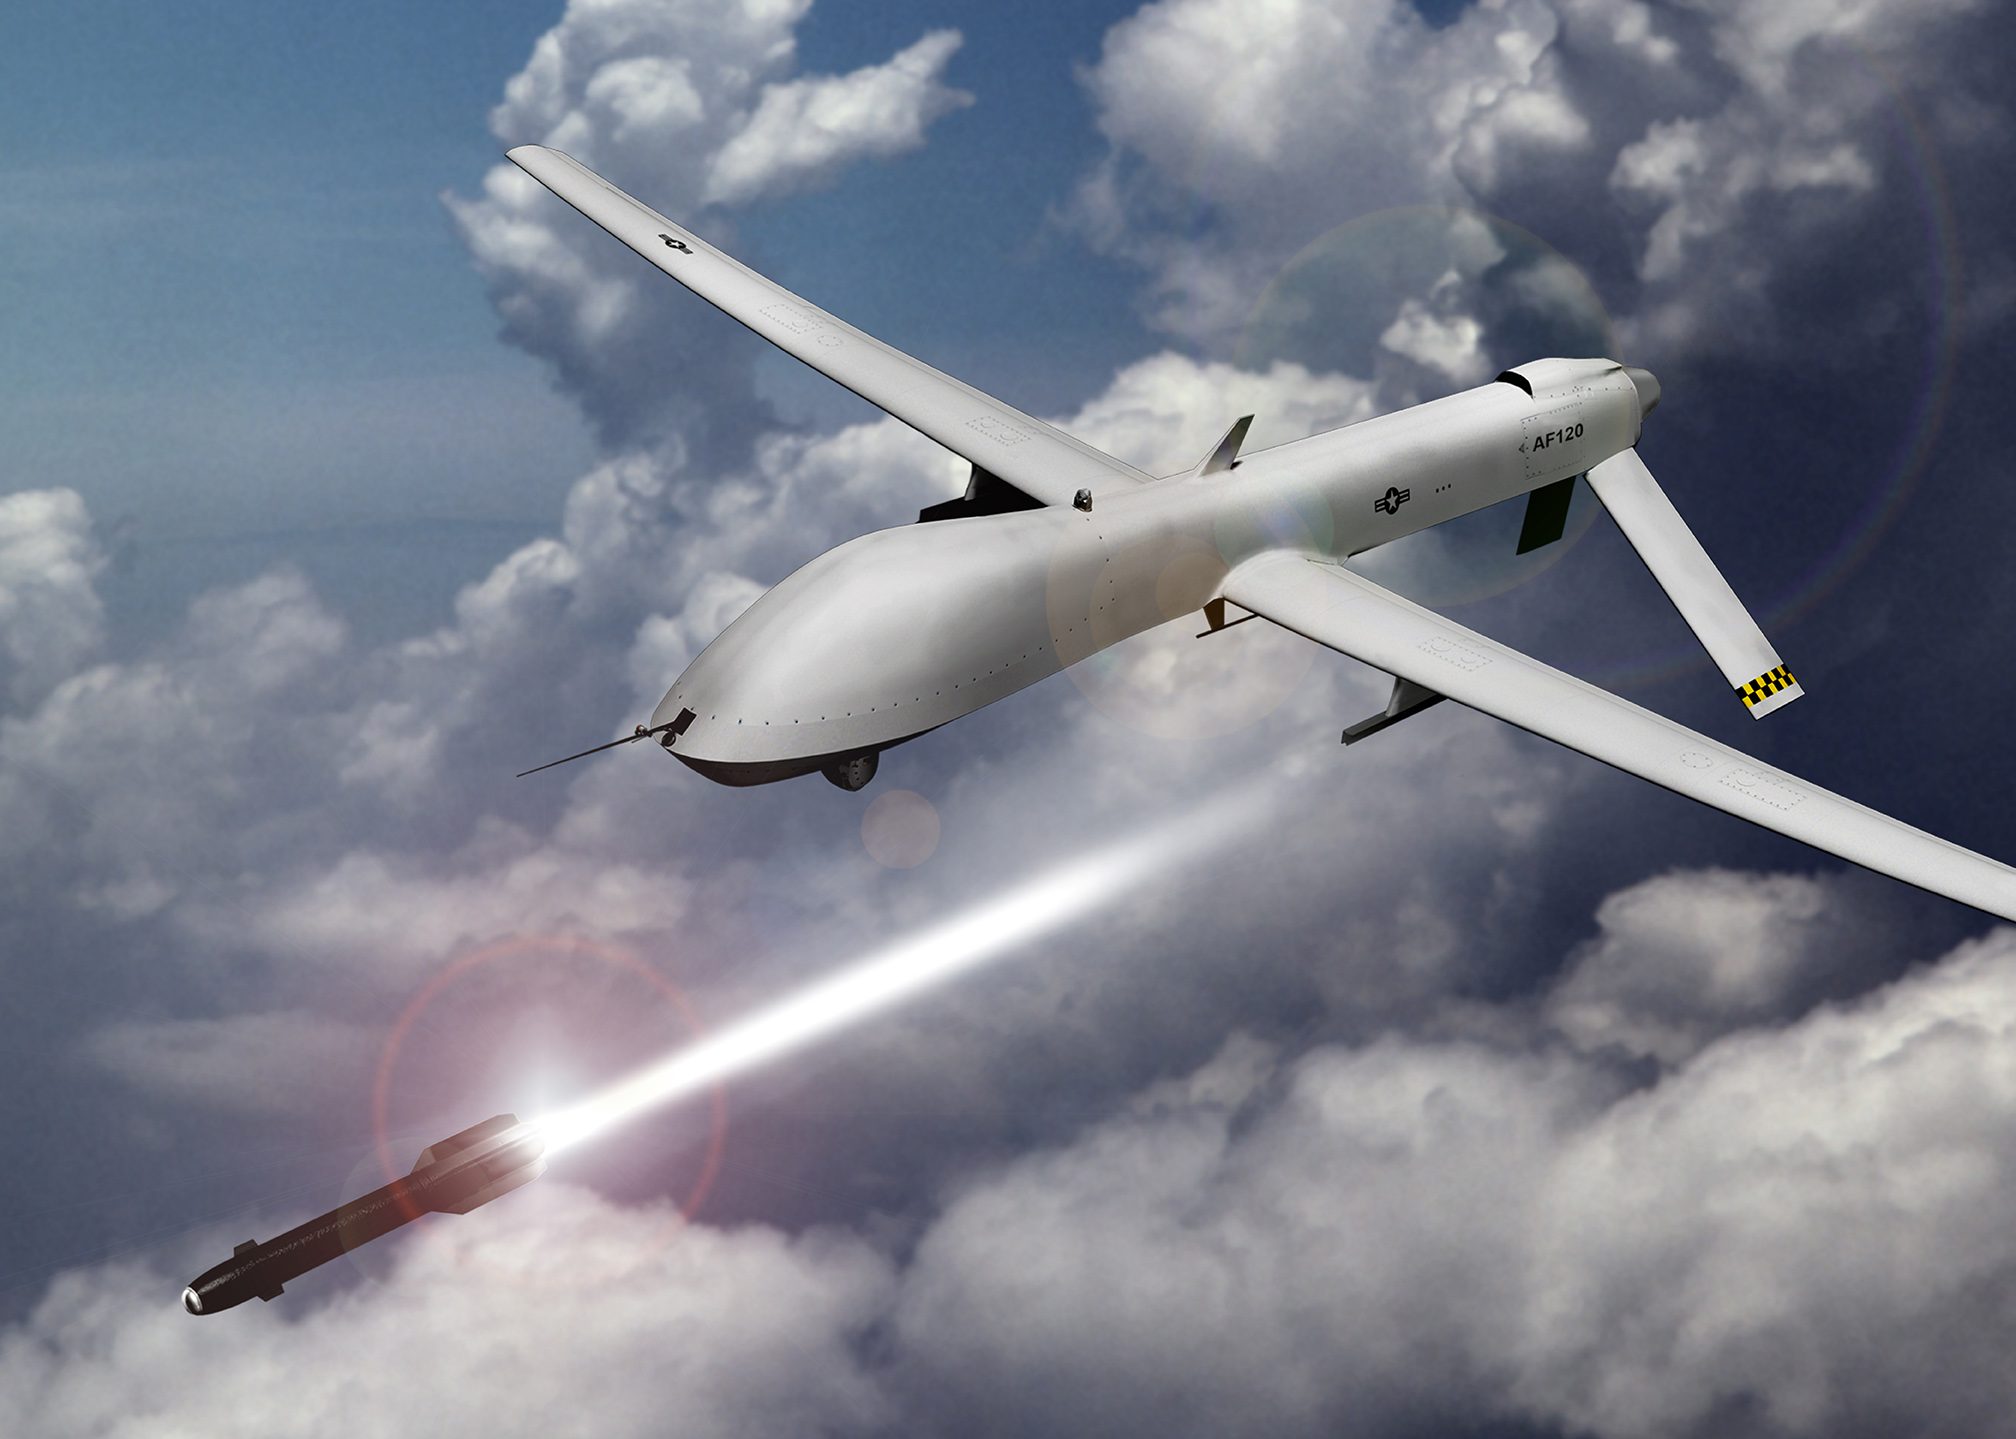 10 Reasons Why Paul Walker Was Killed By A Predator Drone Strike